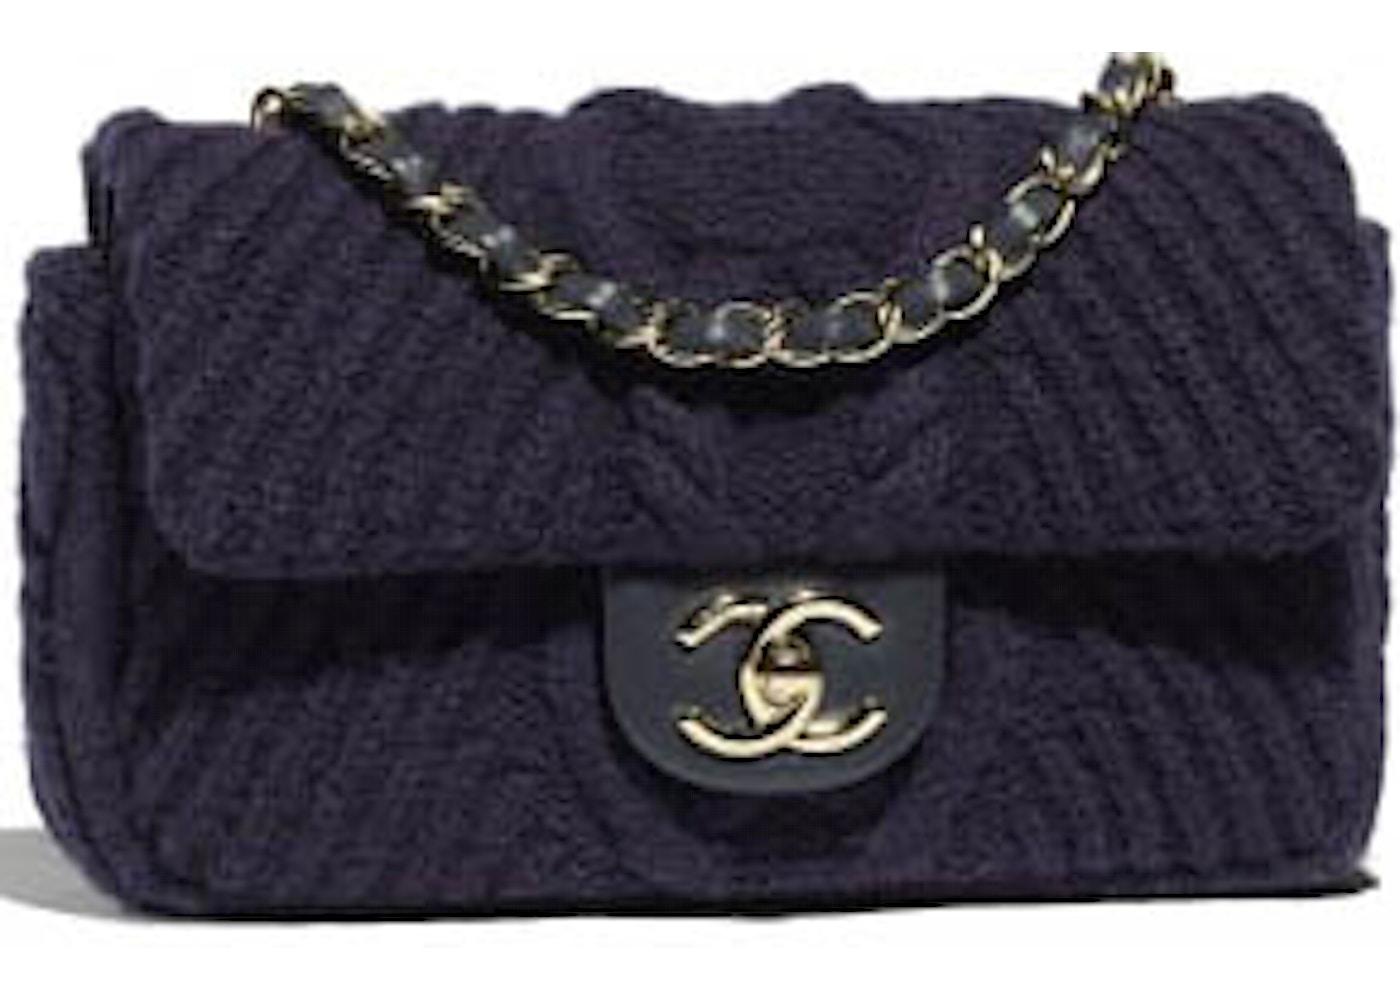 28622a1a732f Chanel Flap Bag Knit Navy. Knit Navy